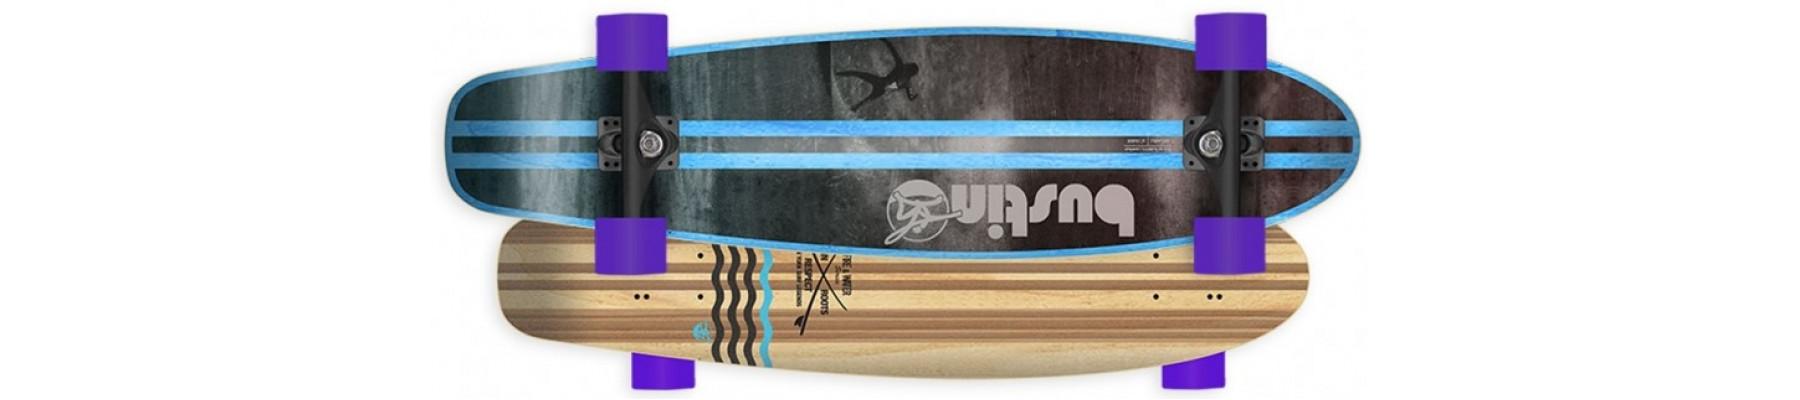 Bustin NY Surf Tribute Cruiser 32